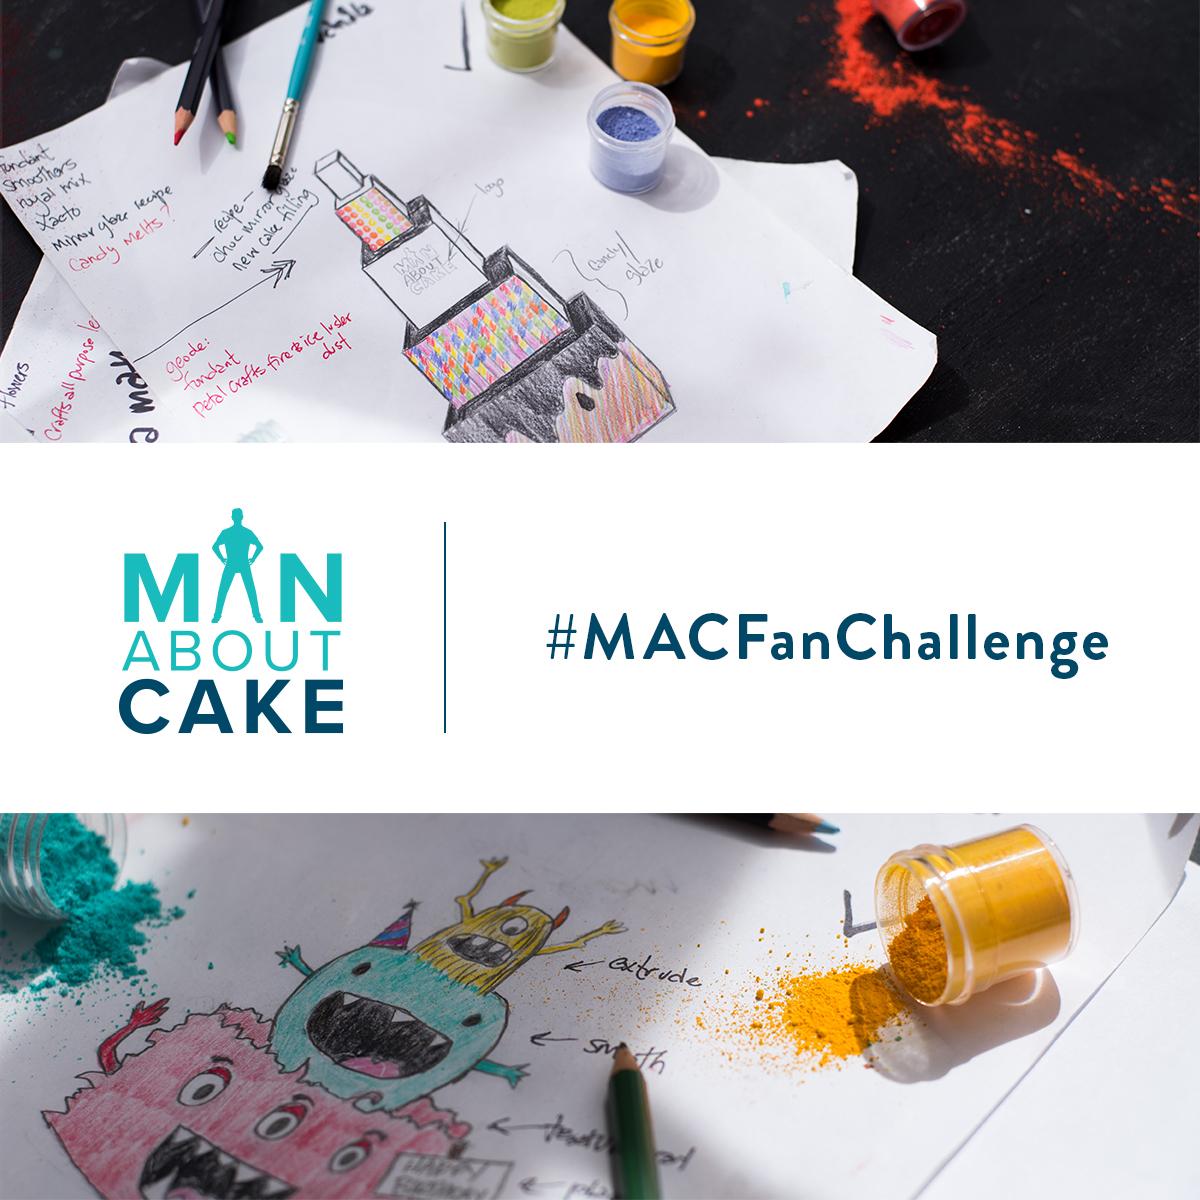 #MACFanChallenge